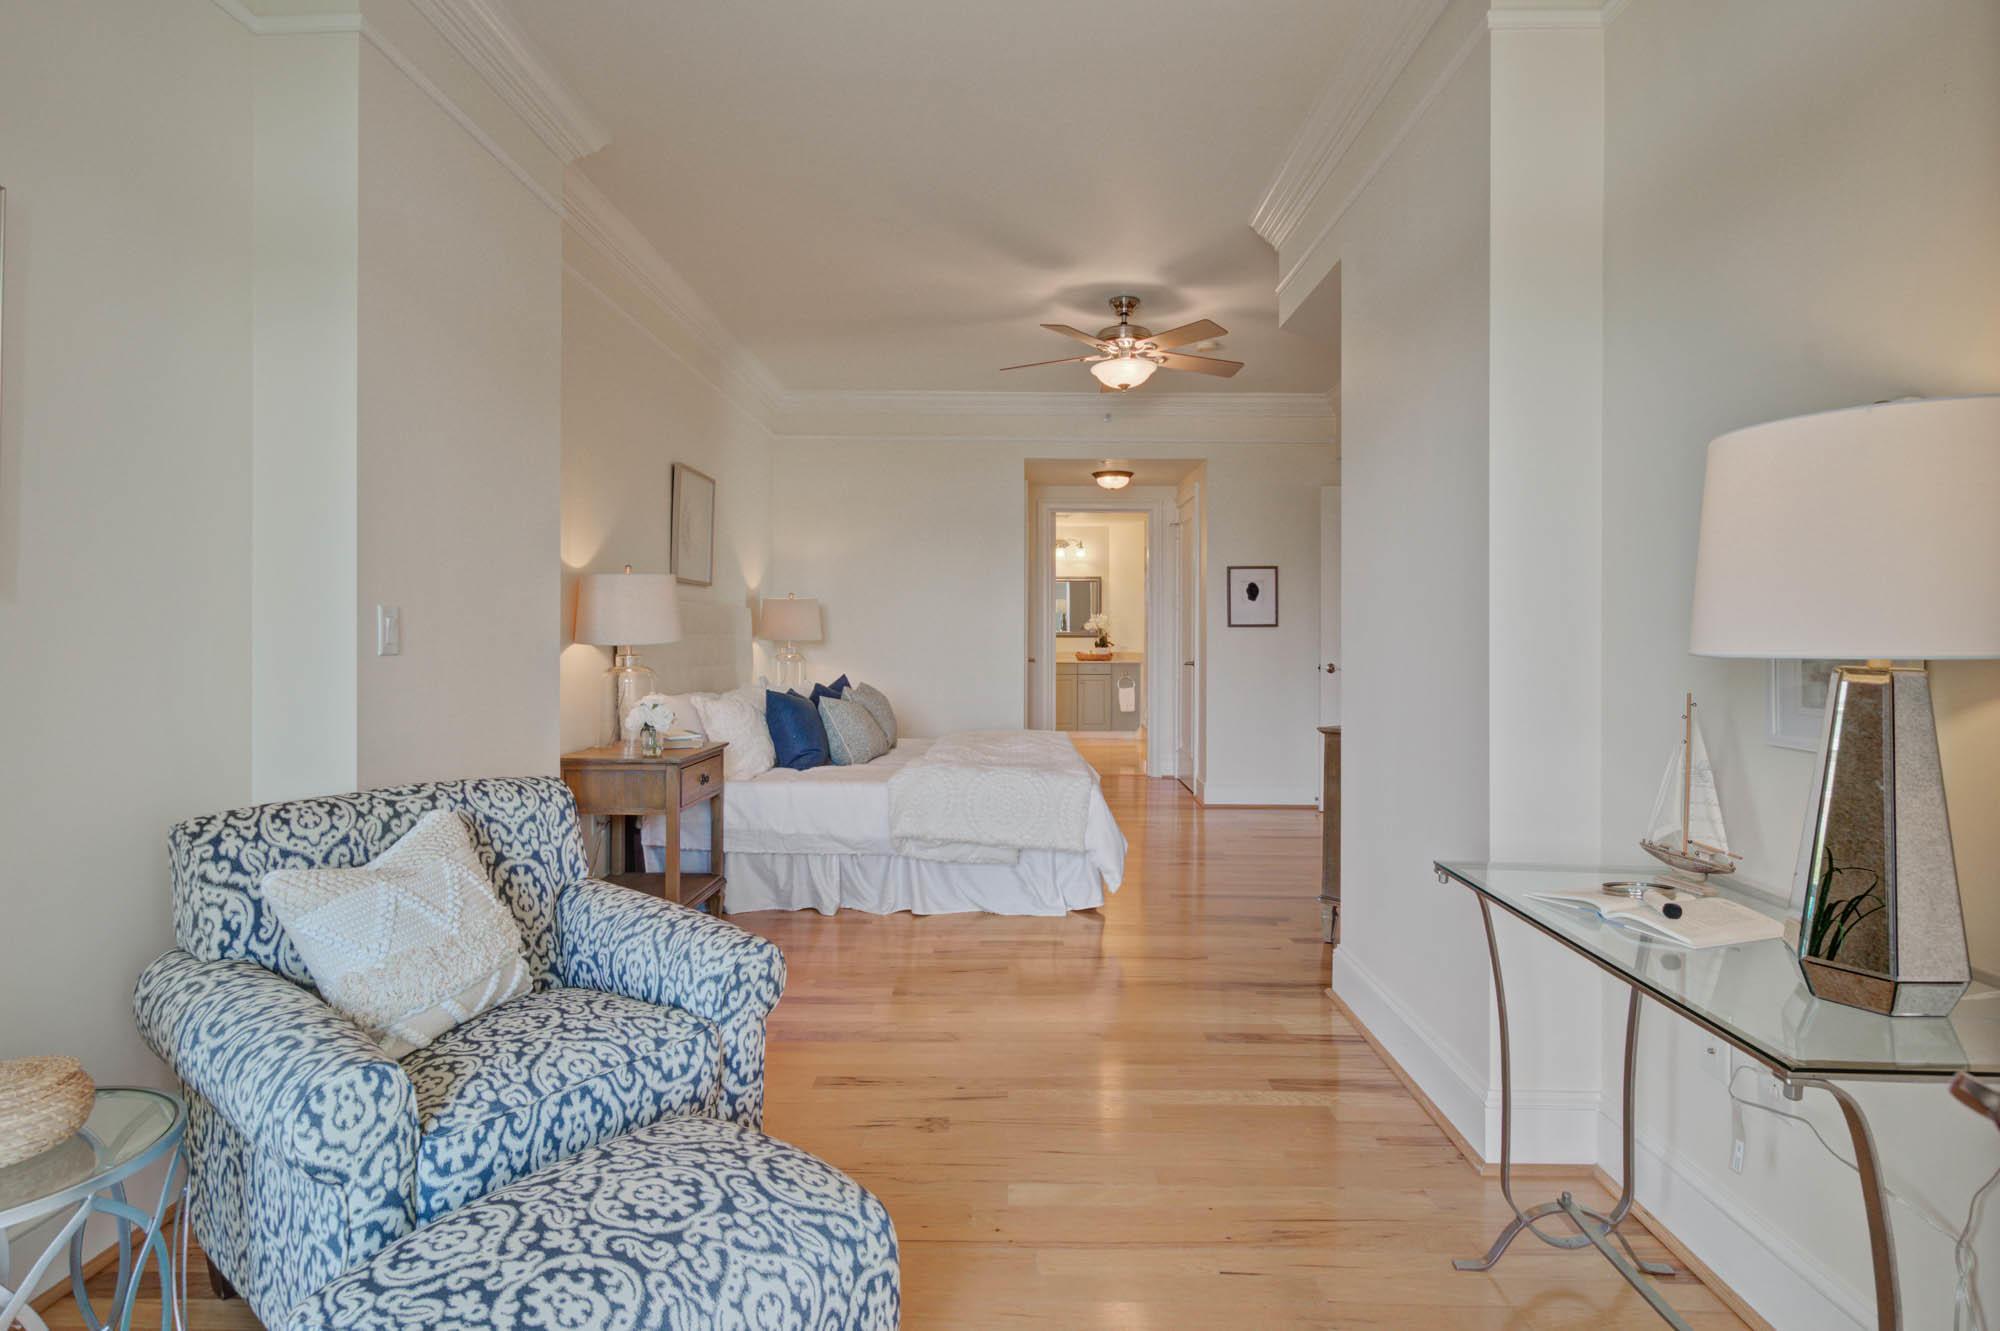 Renaissance On Chas Harbor Homes For Sale - 125 Plaza, Mount Pleasant, SC - 47